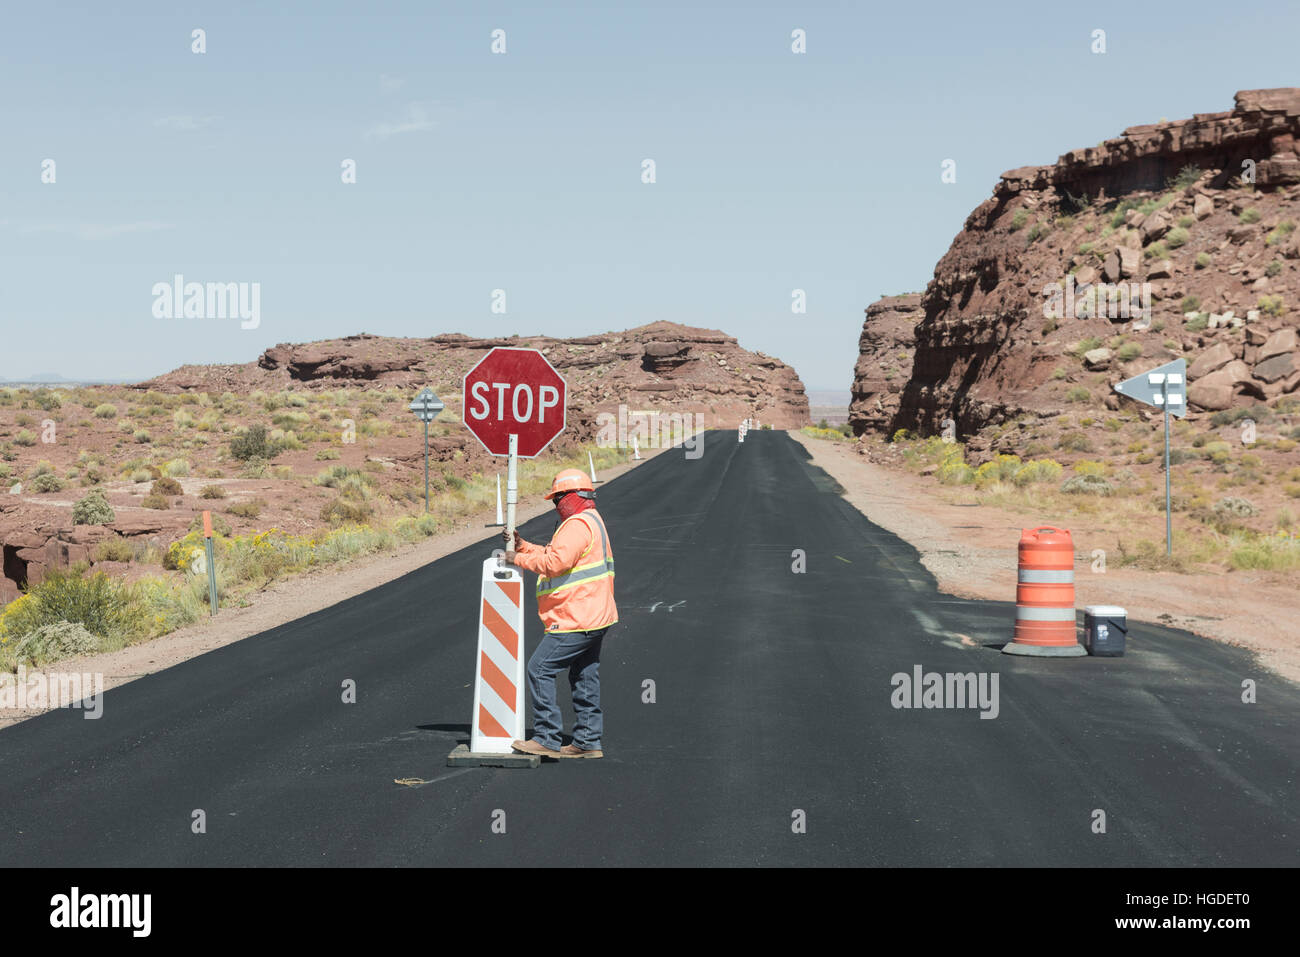 USA, Arizona, Navajo Indian Reservation, Kayenta - Stock Image